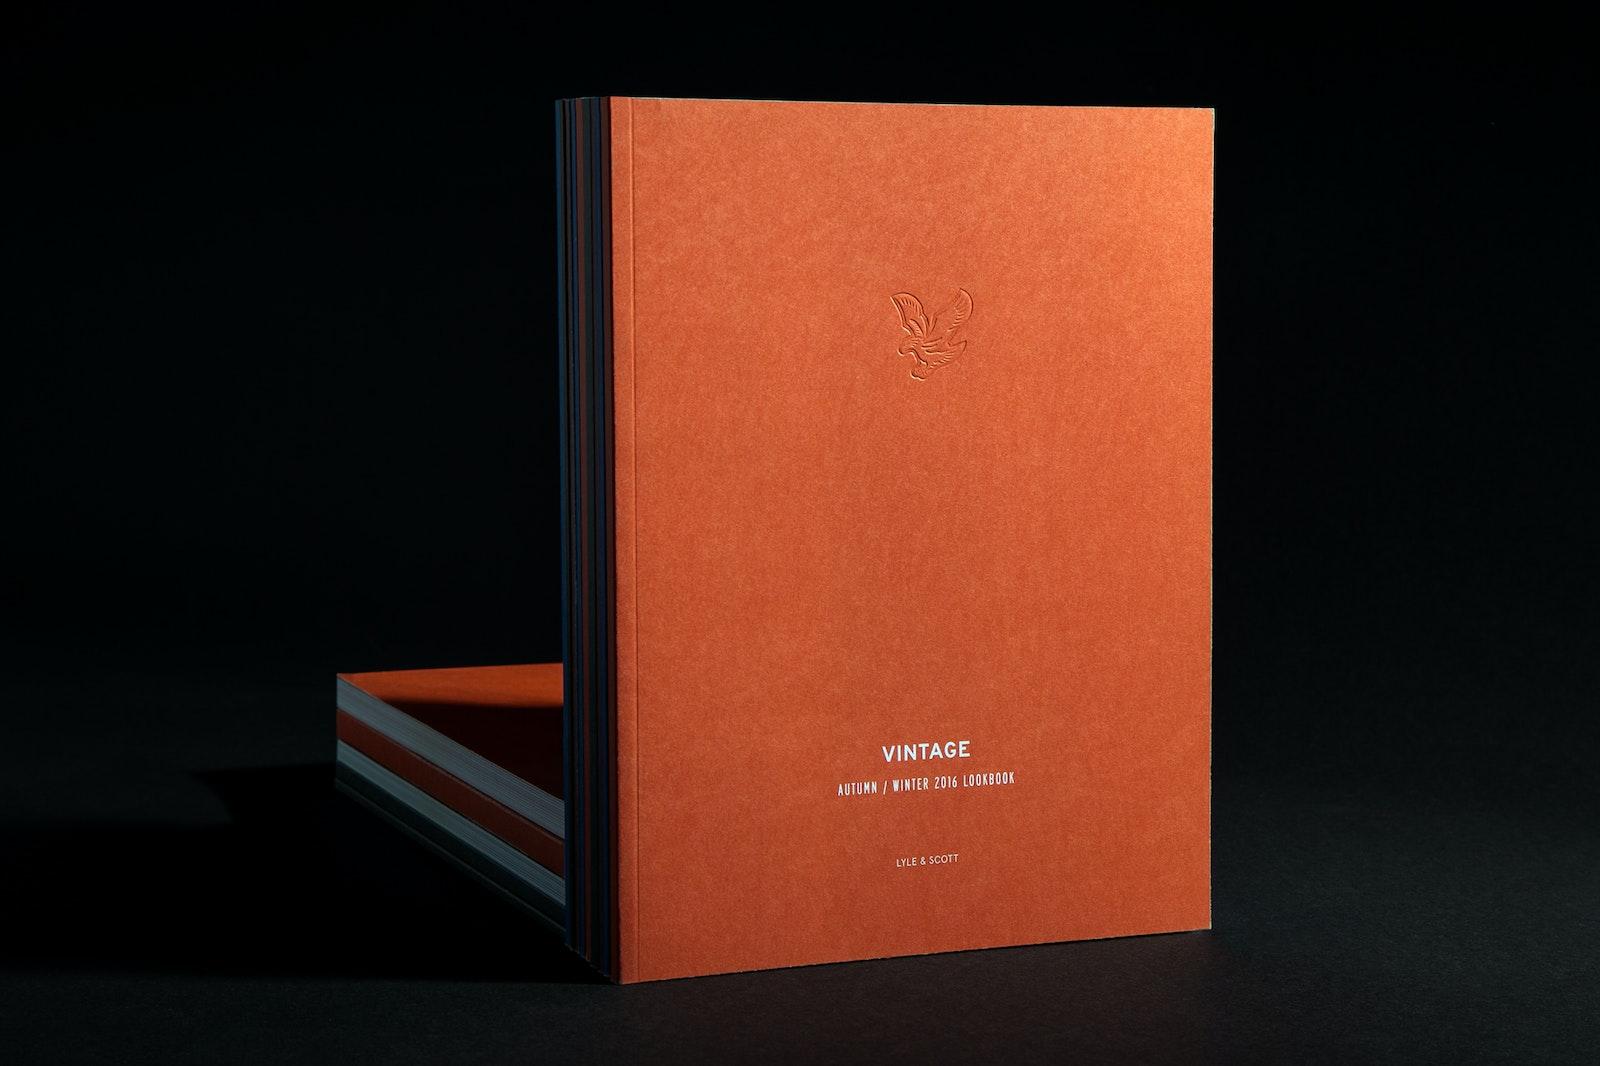 MASTER CS LYLE SCOTT AW16 - Lookbook Cover 01